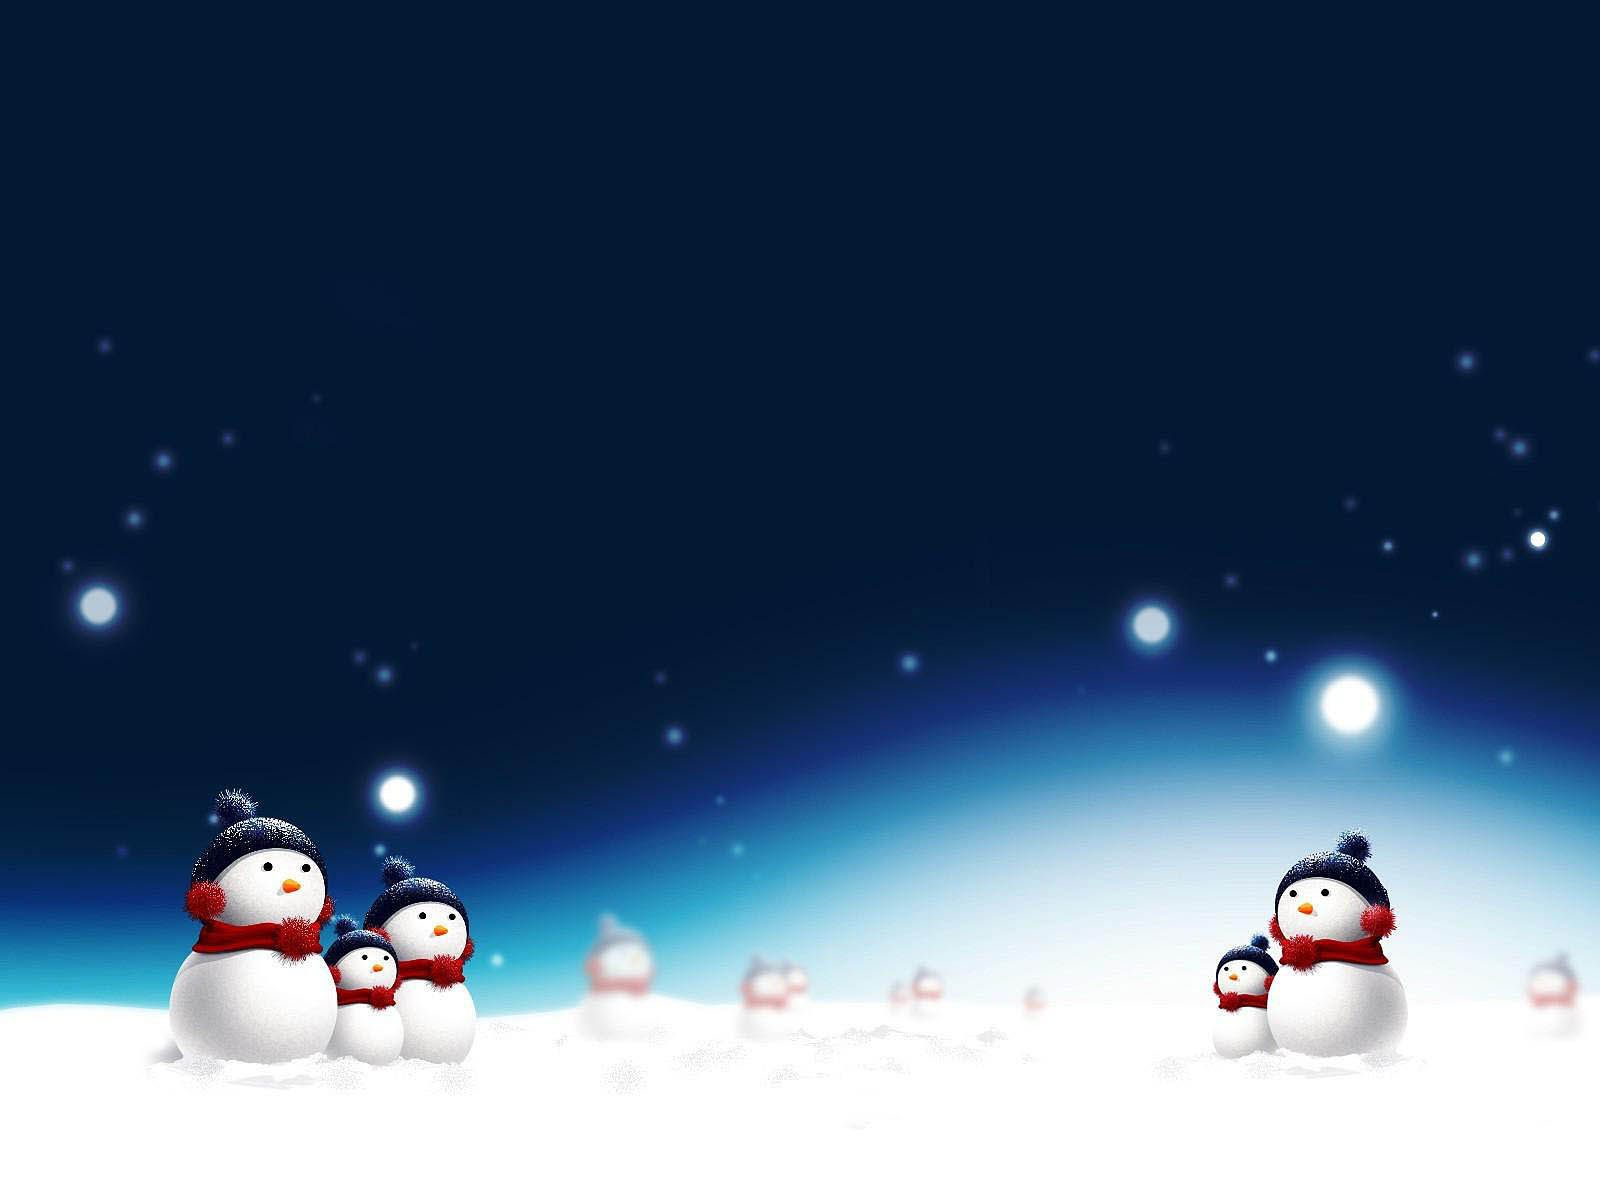 55 Blue Snowman Wallpapers   Download at WallpaperBro 1600x1200